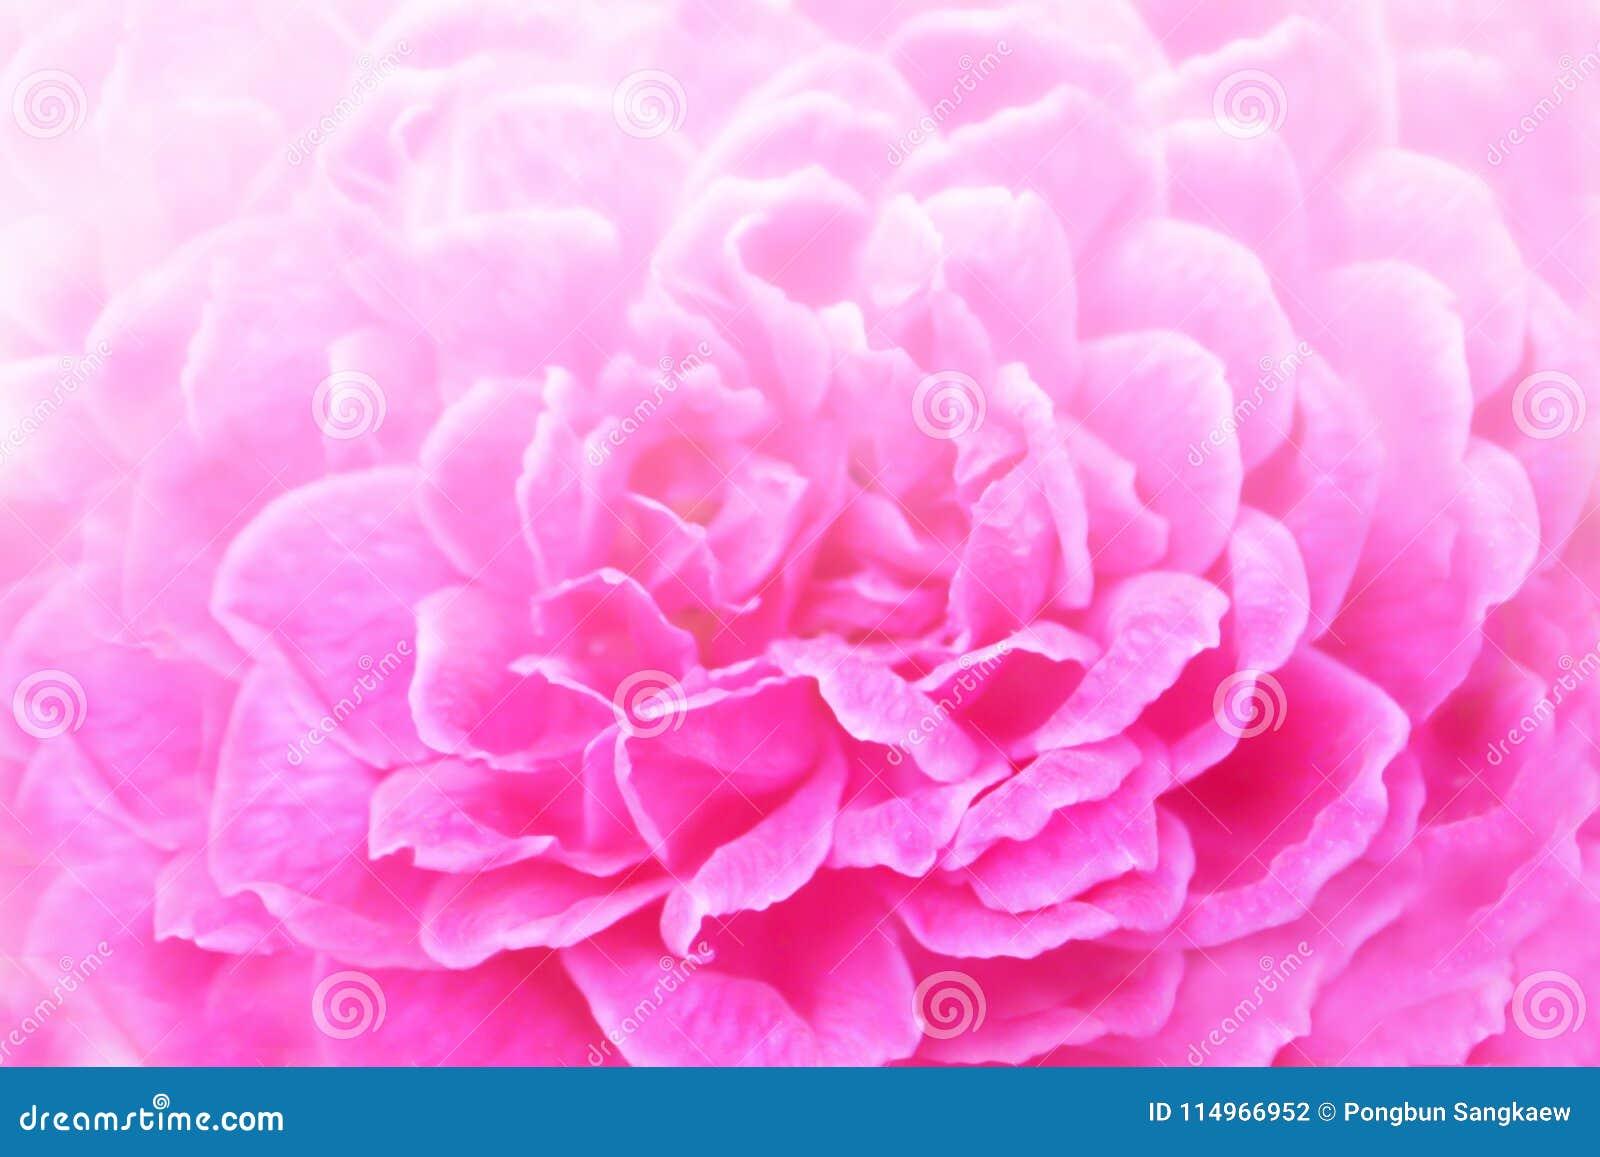 Soft Focus Of Pink Rose Sweetromantic Wedding Wallpaper Background